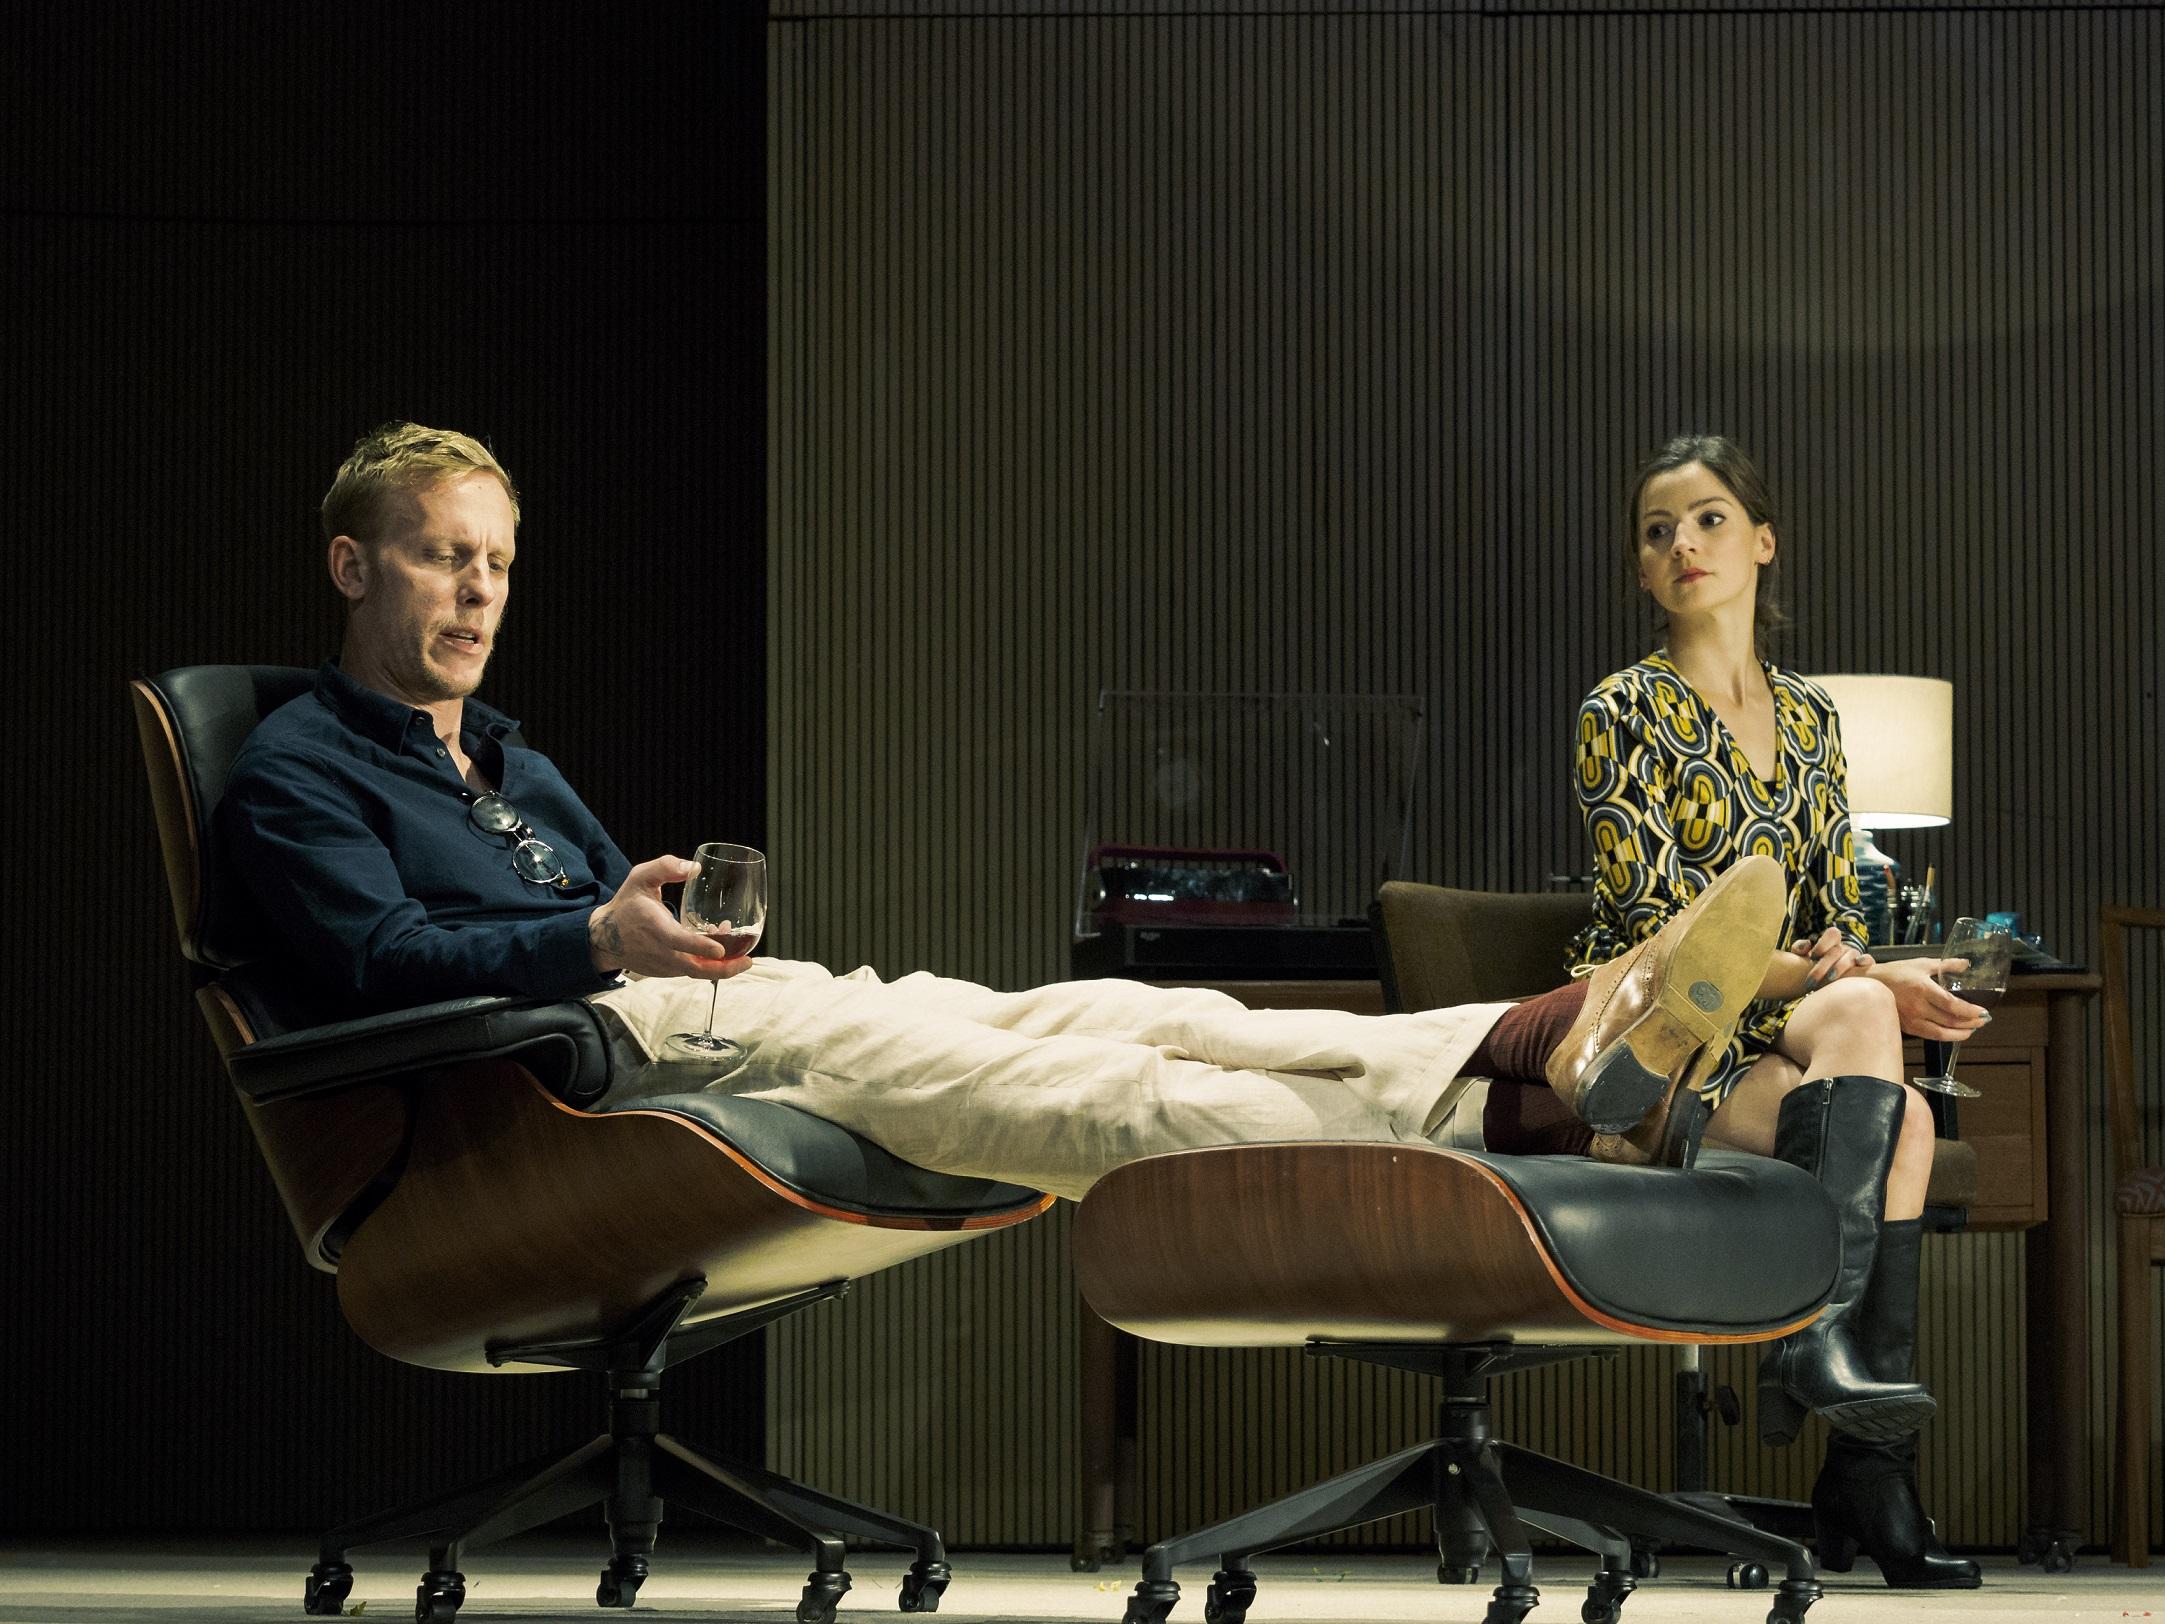 Laurence-Fox-Flora-Spencer-Longhurst-in-The-Real-Thing-CREDIT-Edmond-Terakopian-2.jpg